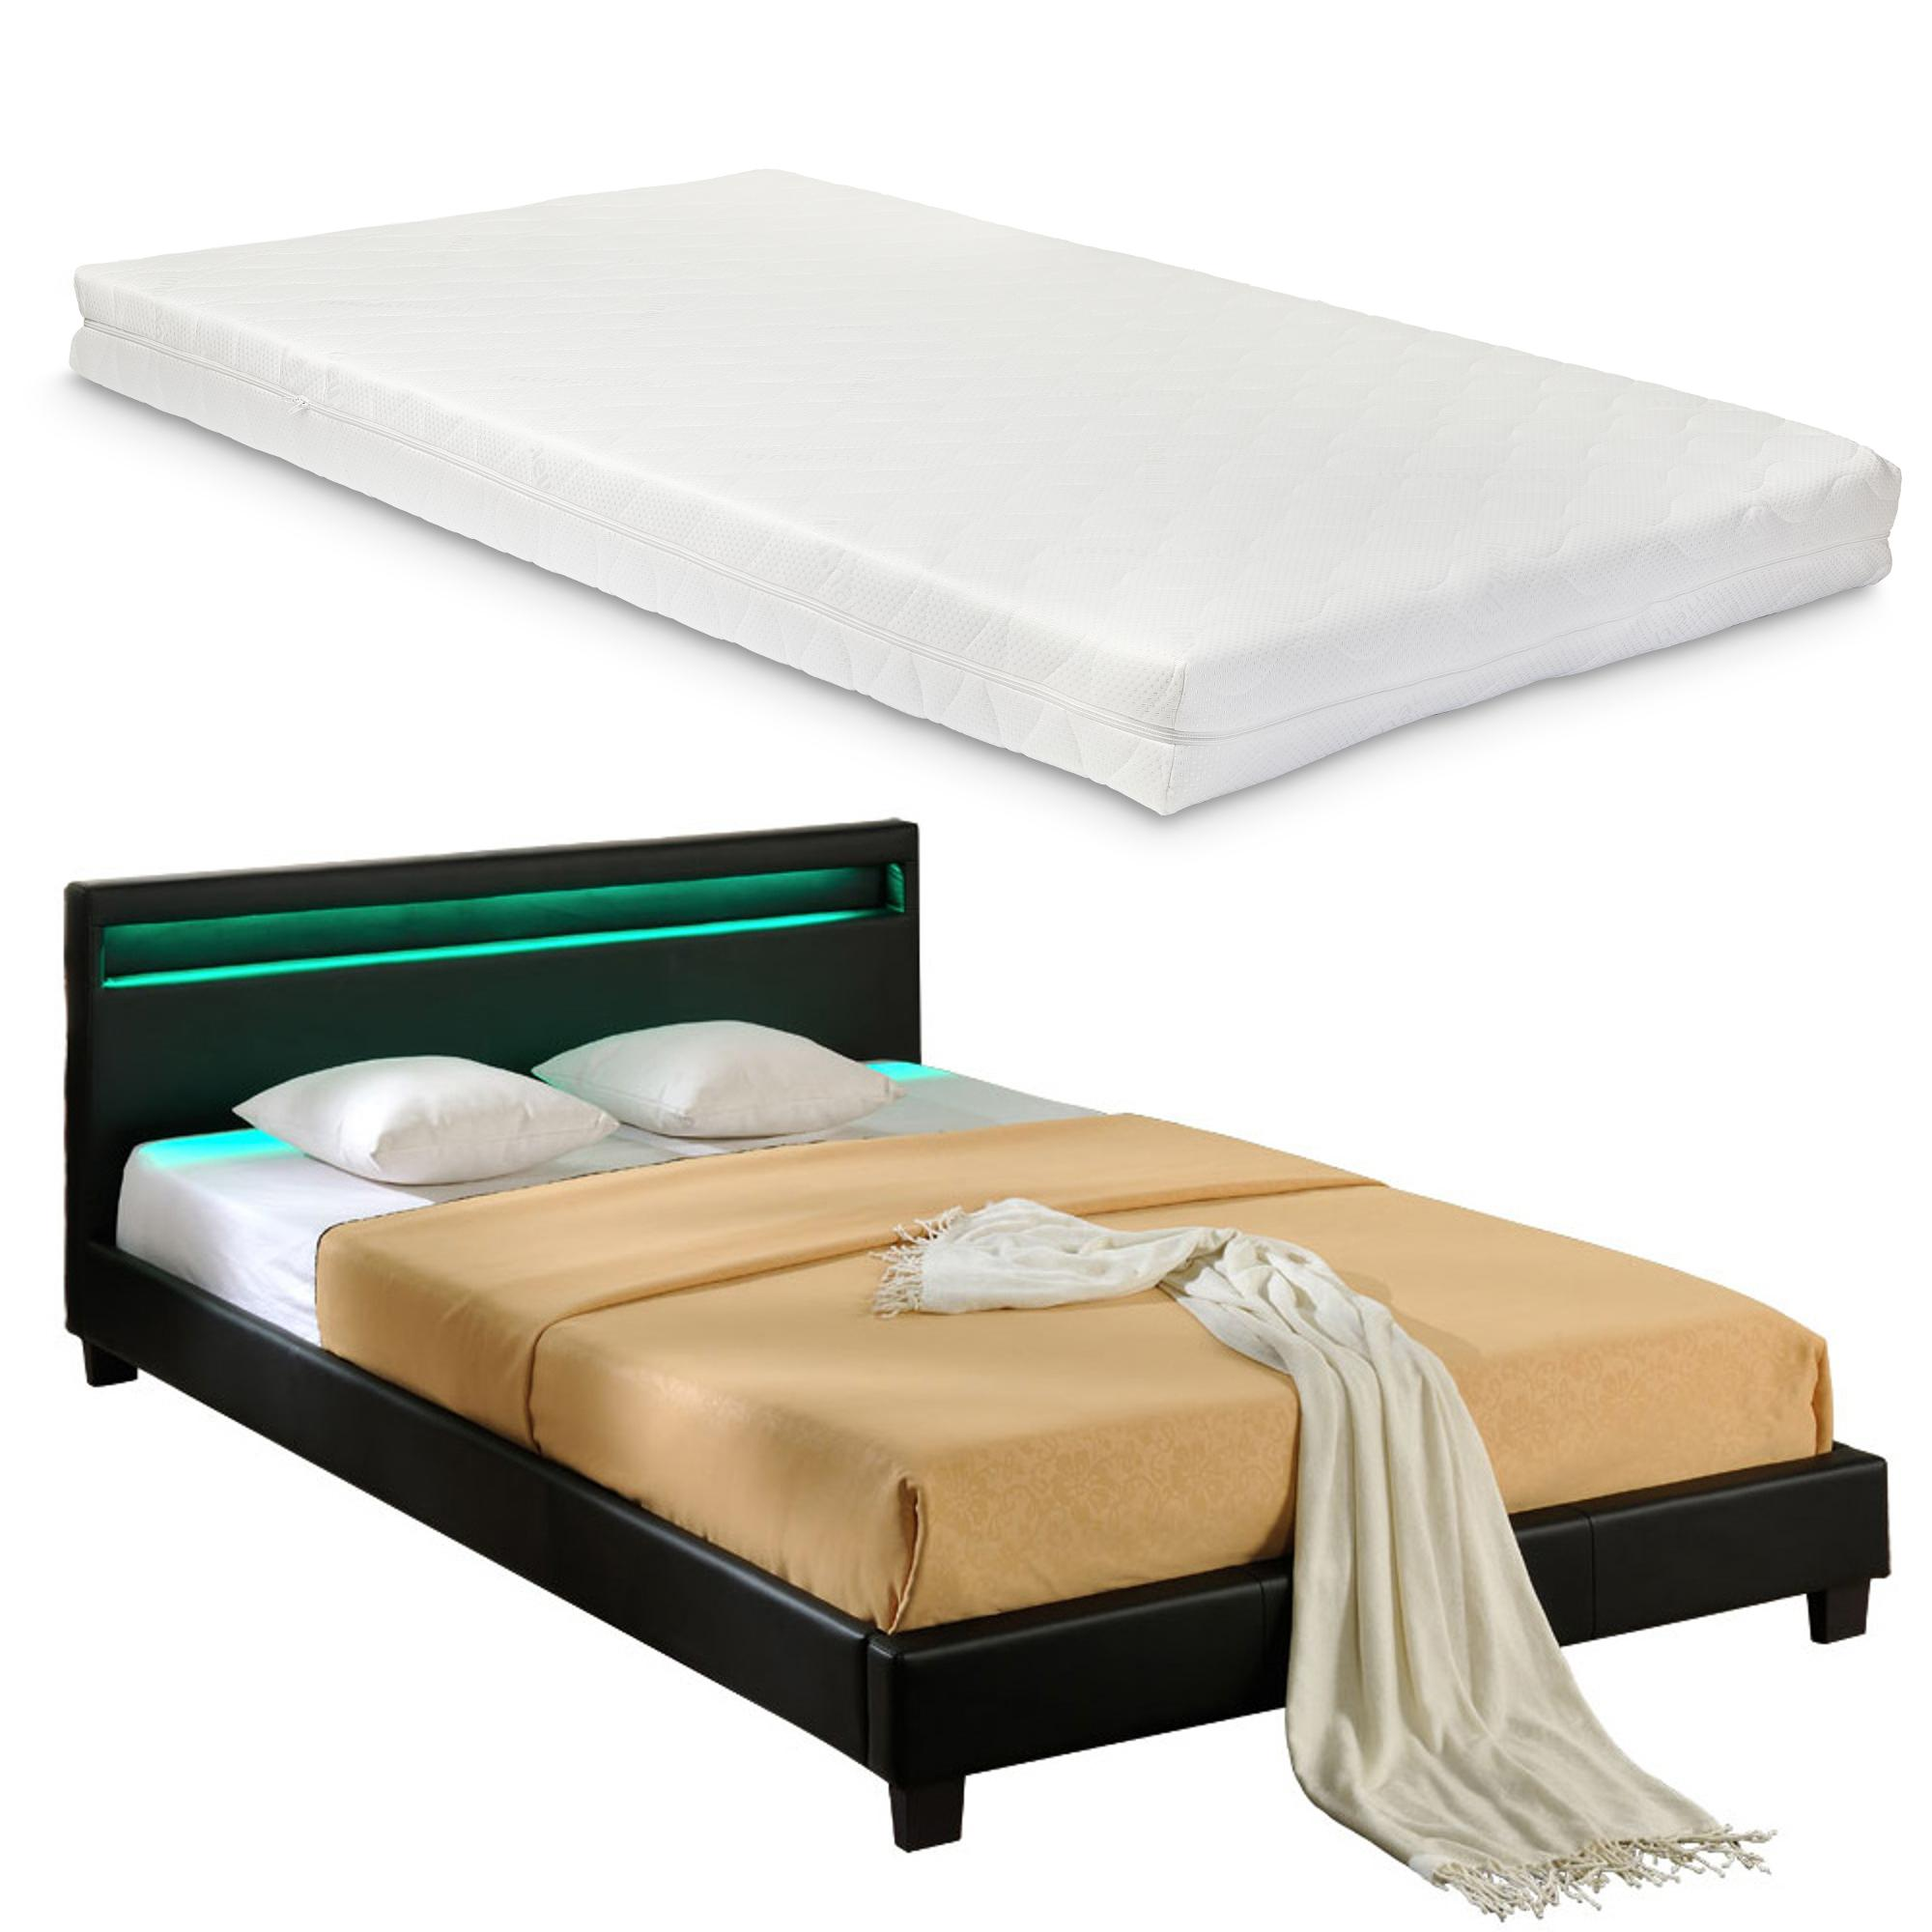 Corium® Moderná manželská posteľ s matracom 'Paris' - čierna - 160 x 200 cm